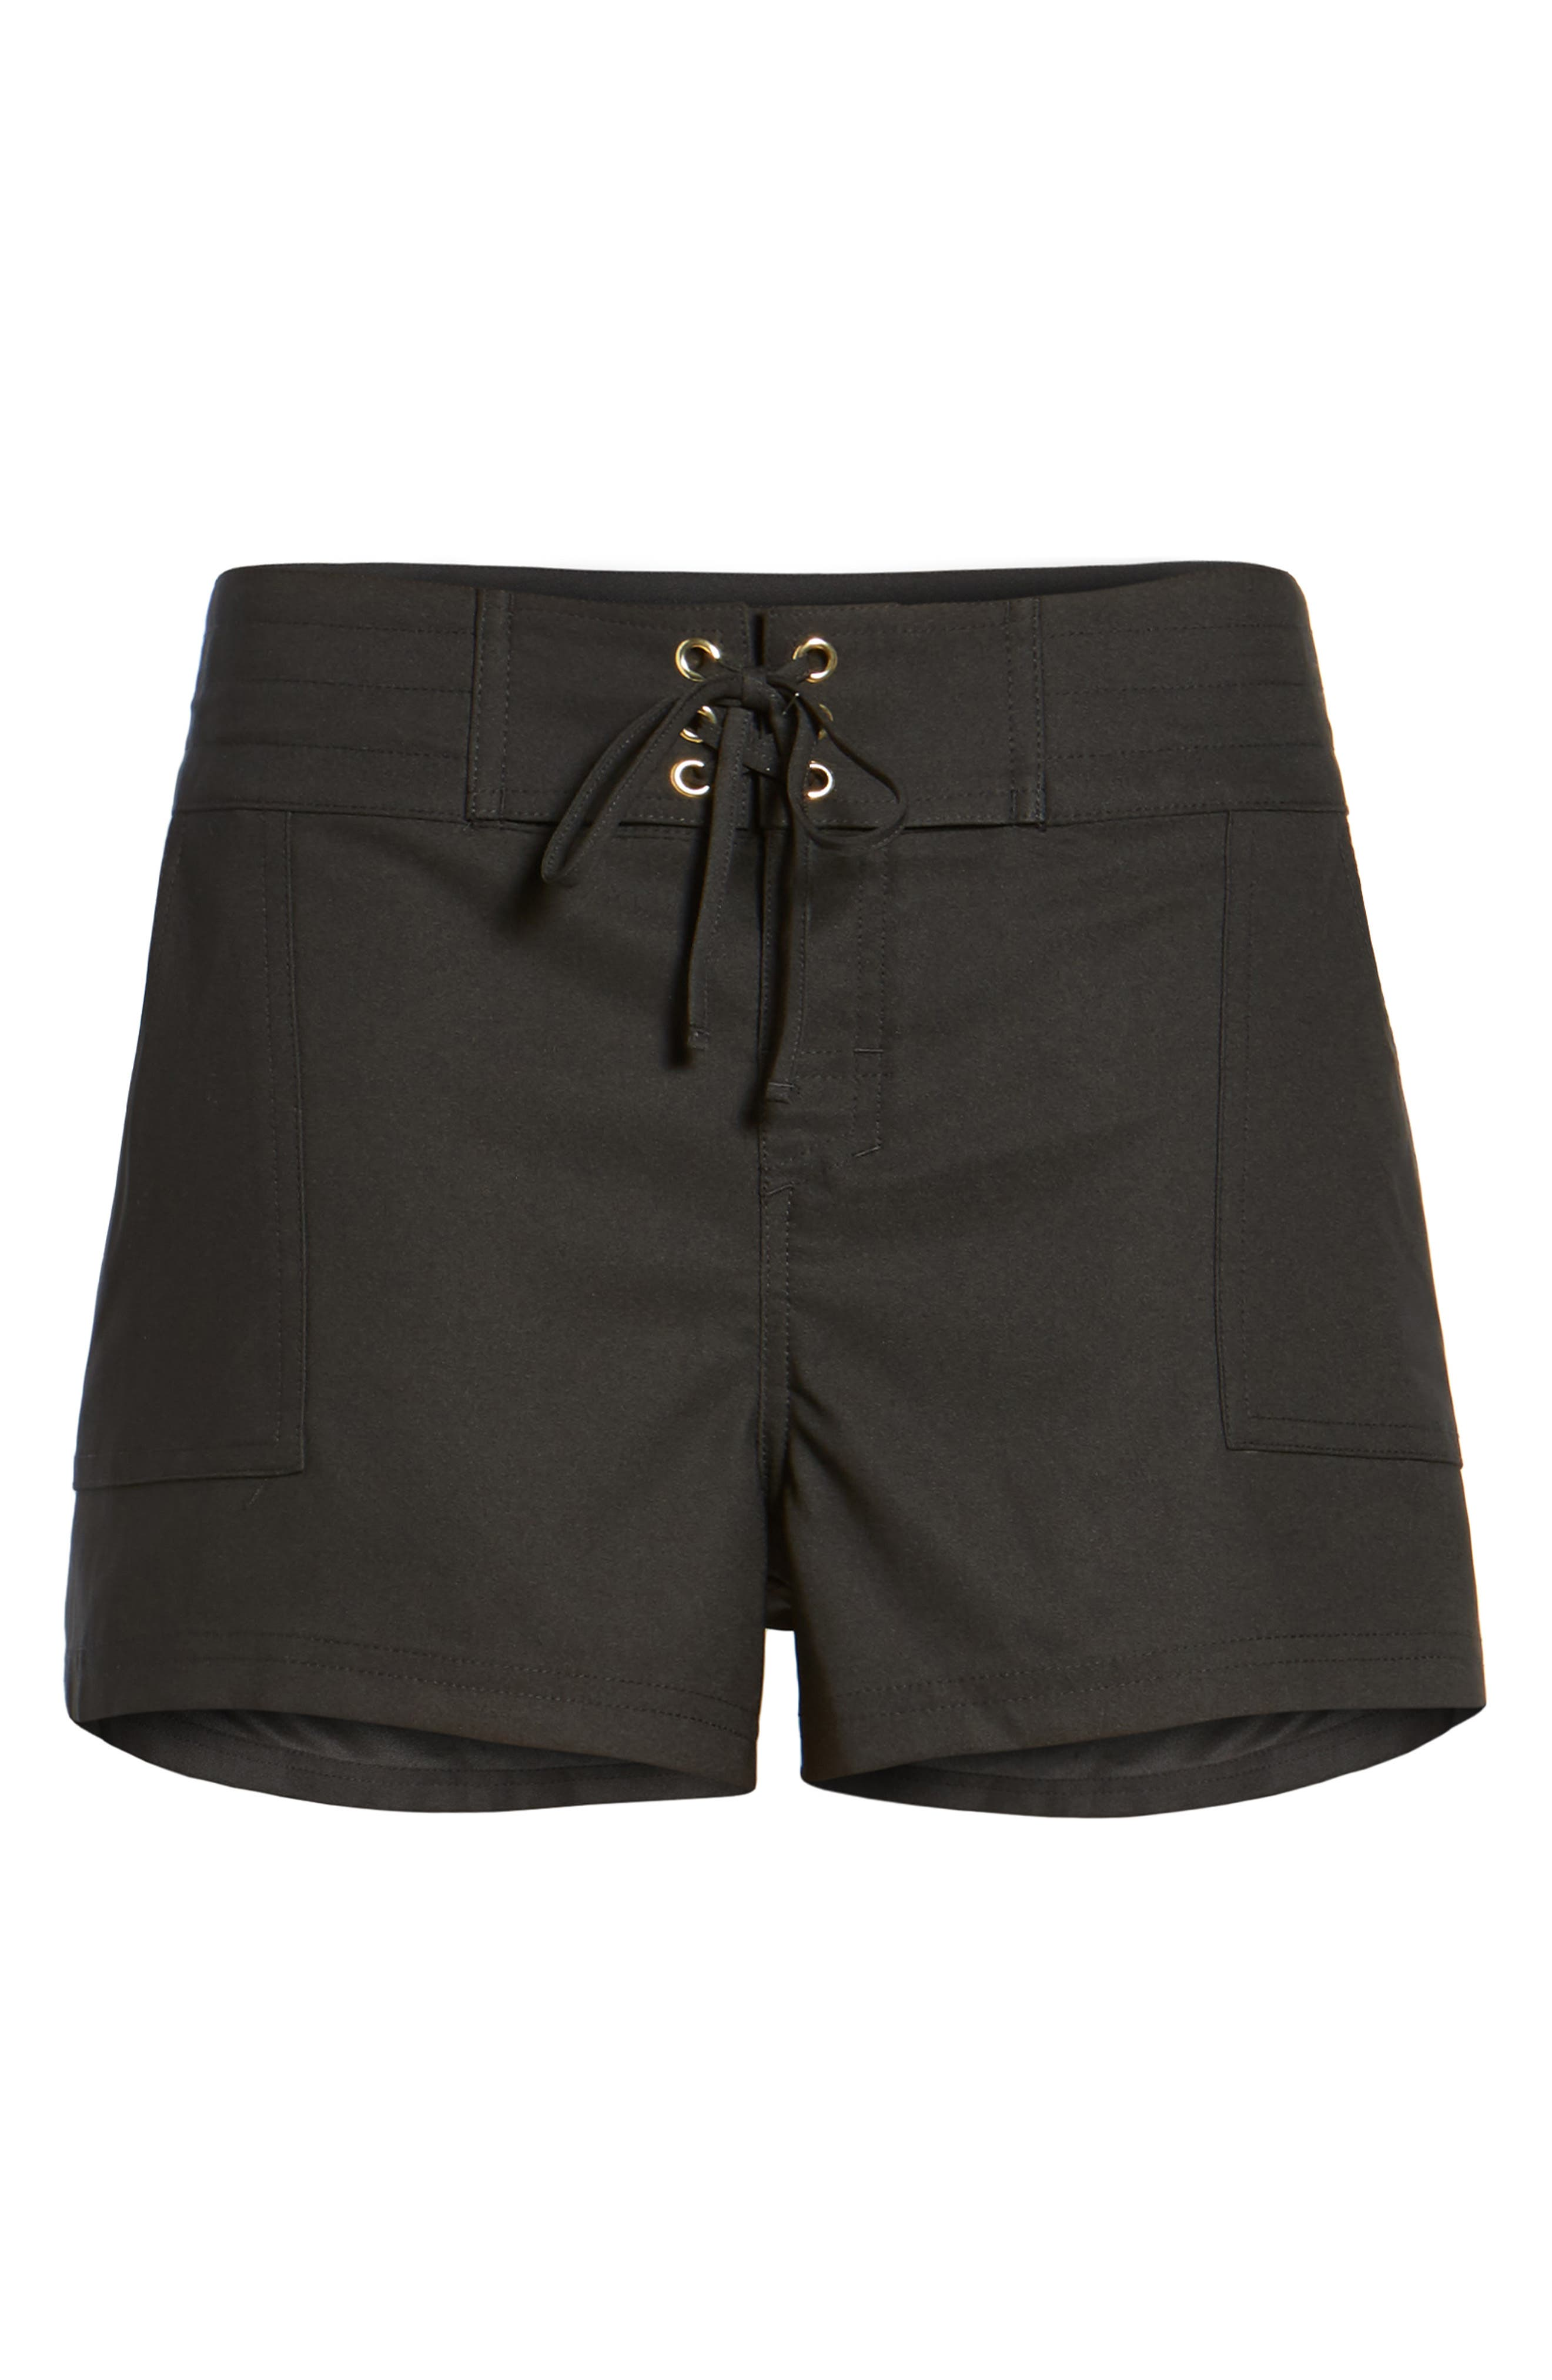 'Boardwalk' Shorts,                             Main thumbnail 1, color,                             BLACK